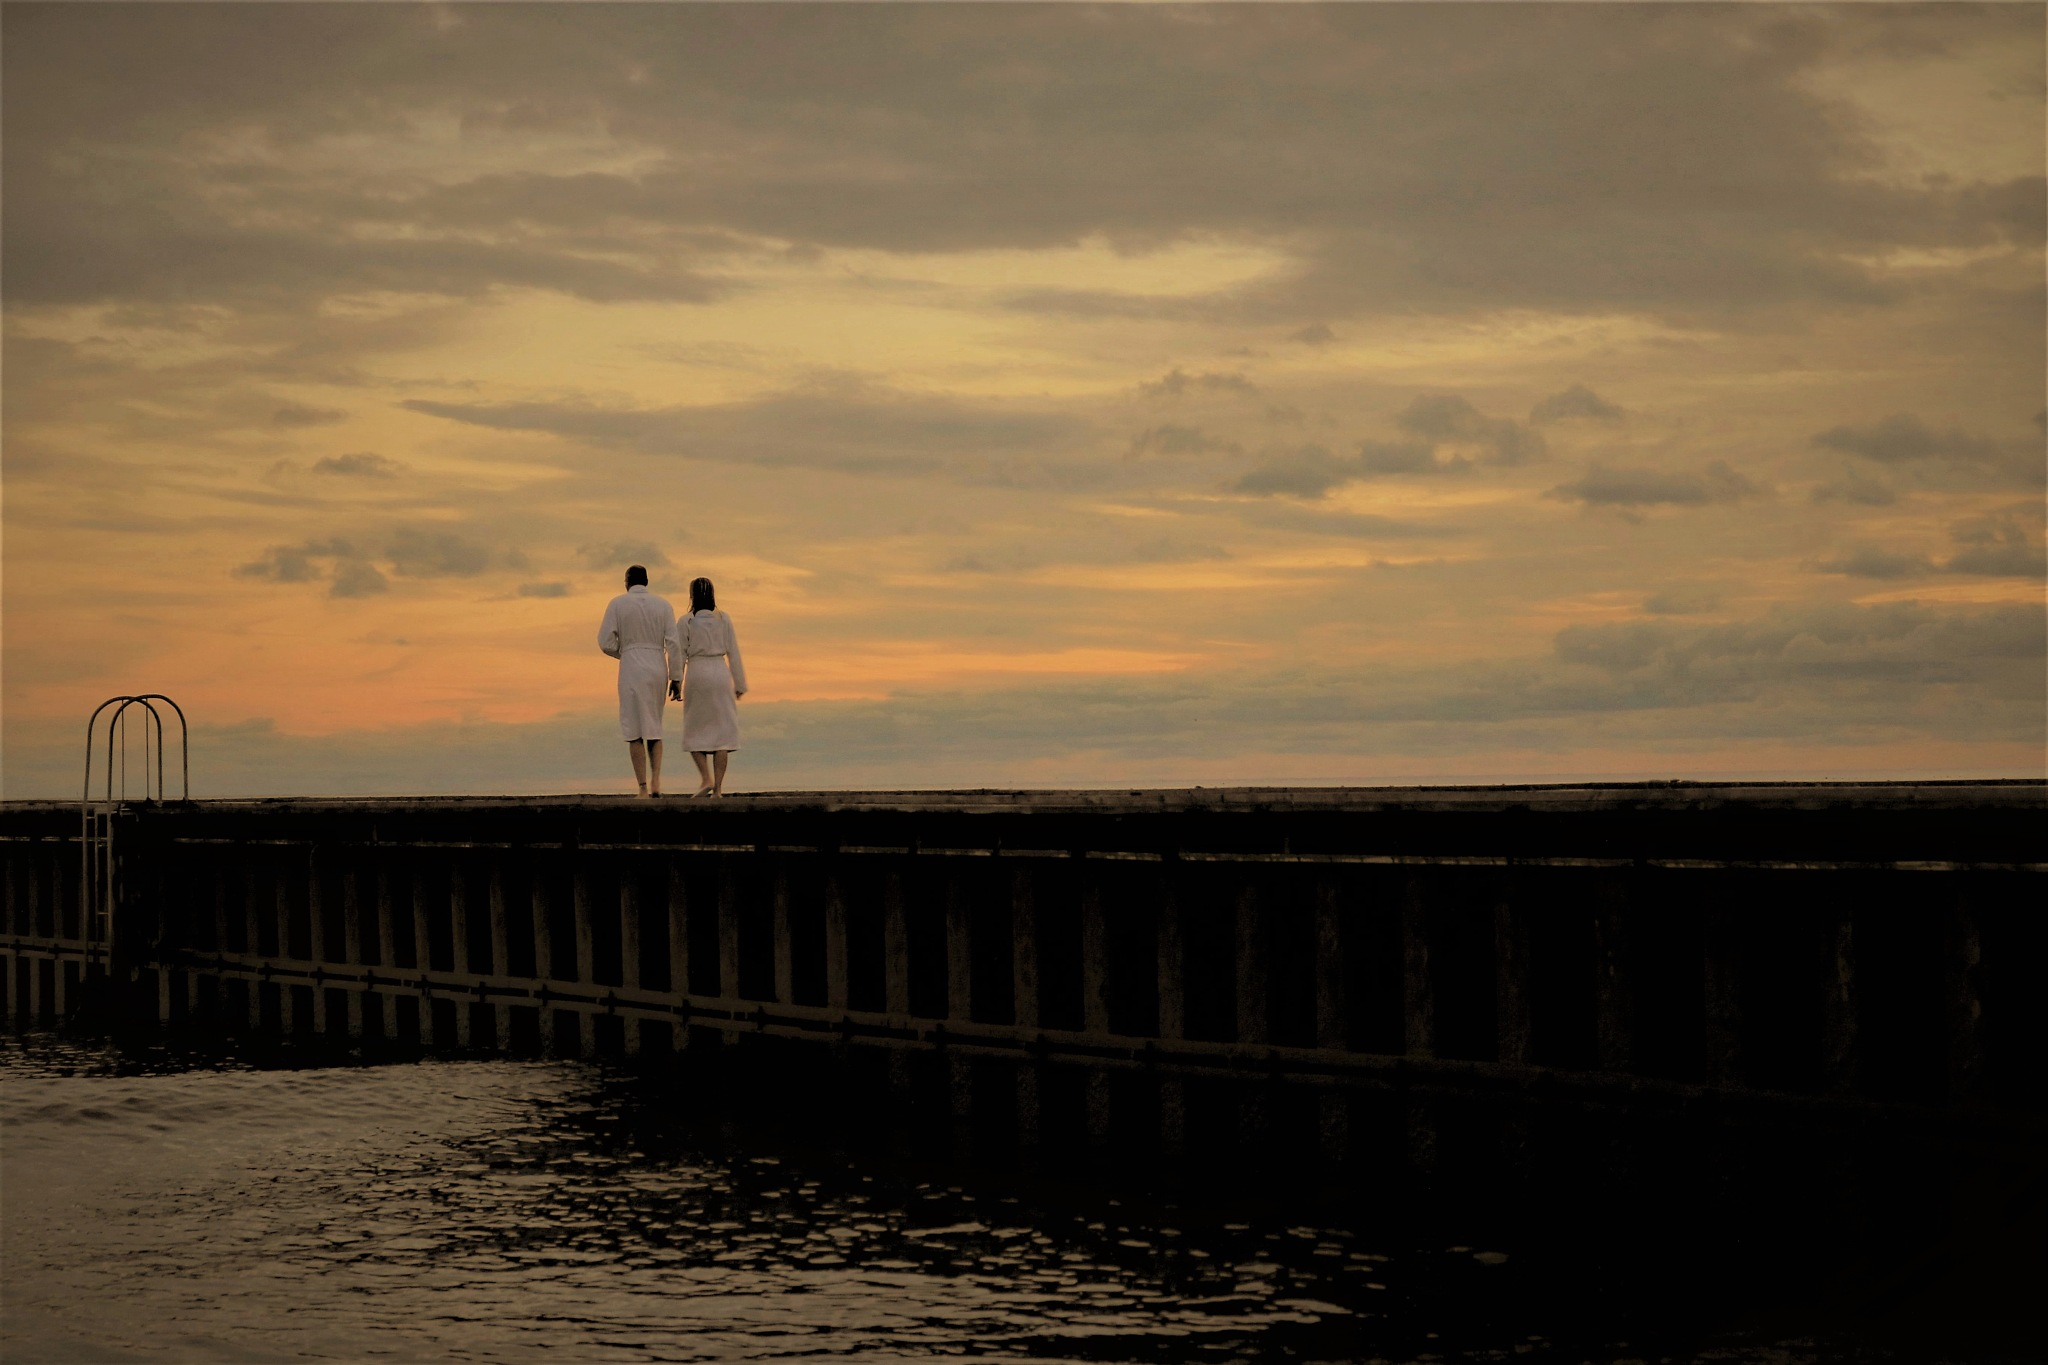 On the Bridge. by KerstinP.